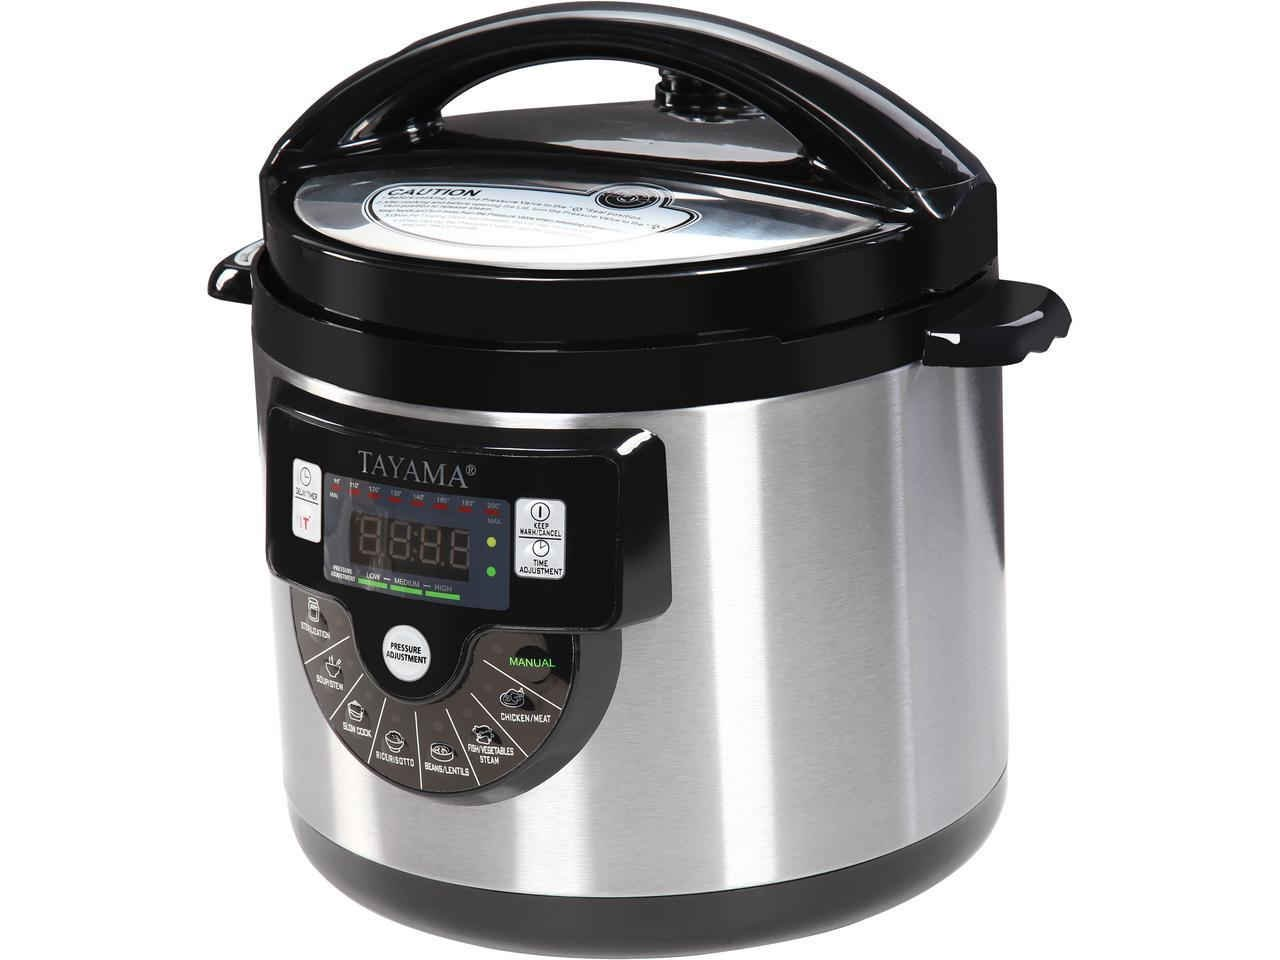 Tayama TMC-60XL 6 quart 8-in-1 Multi-Function Pressure Cooker, Black